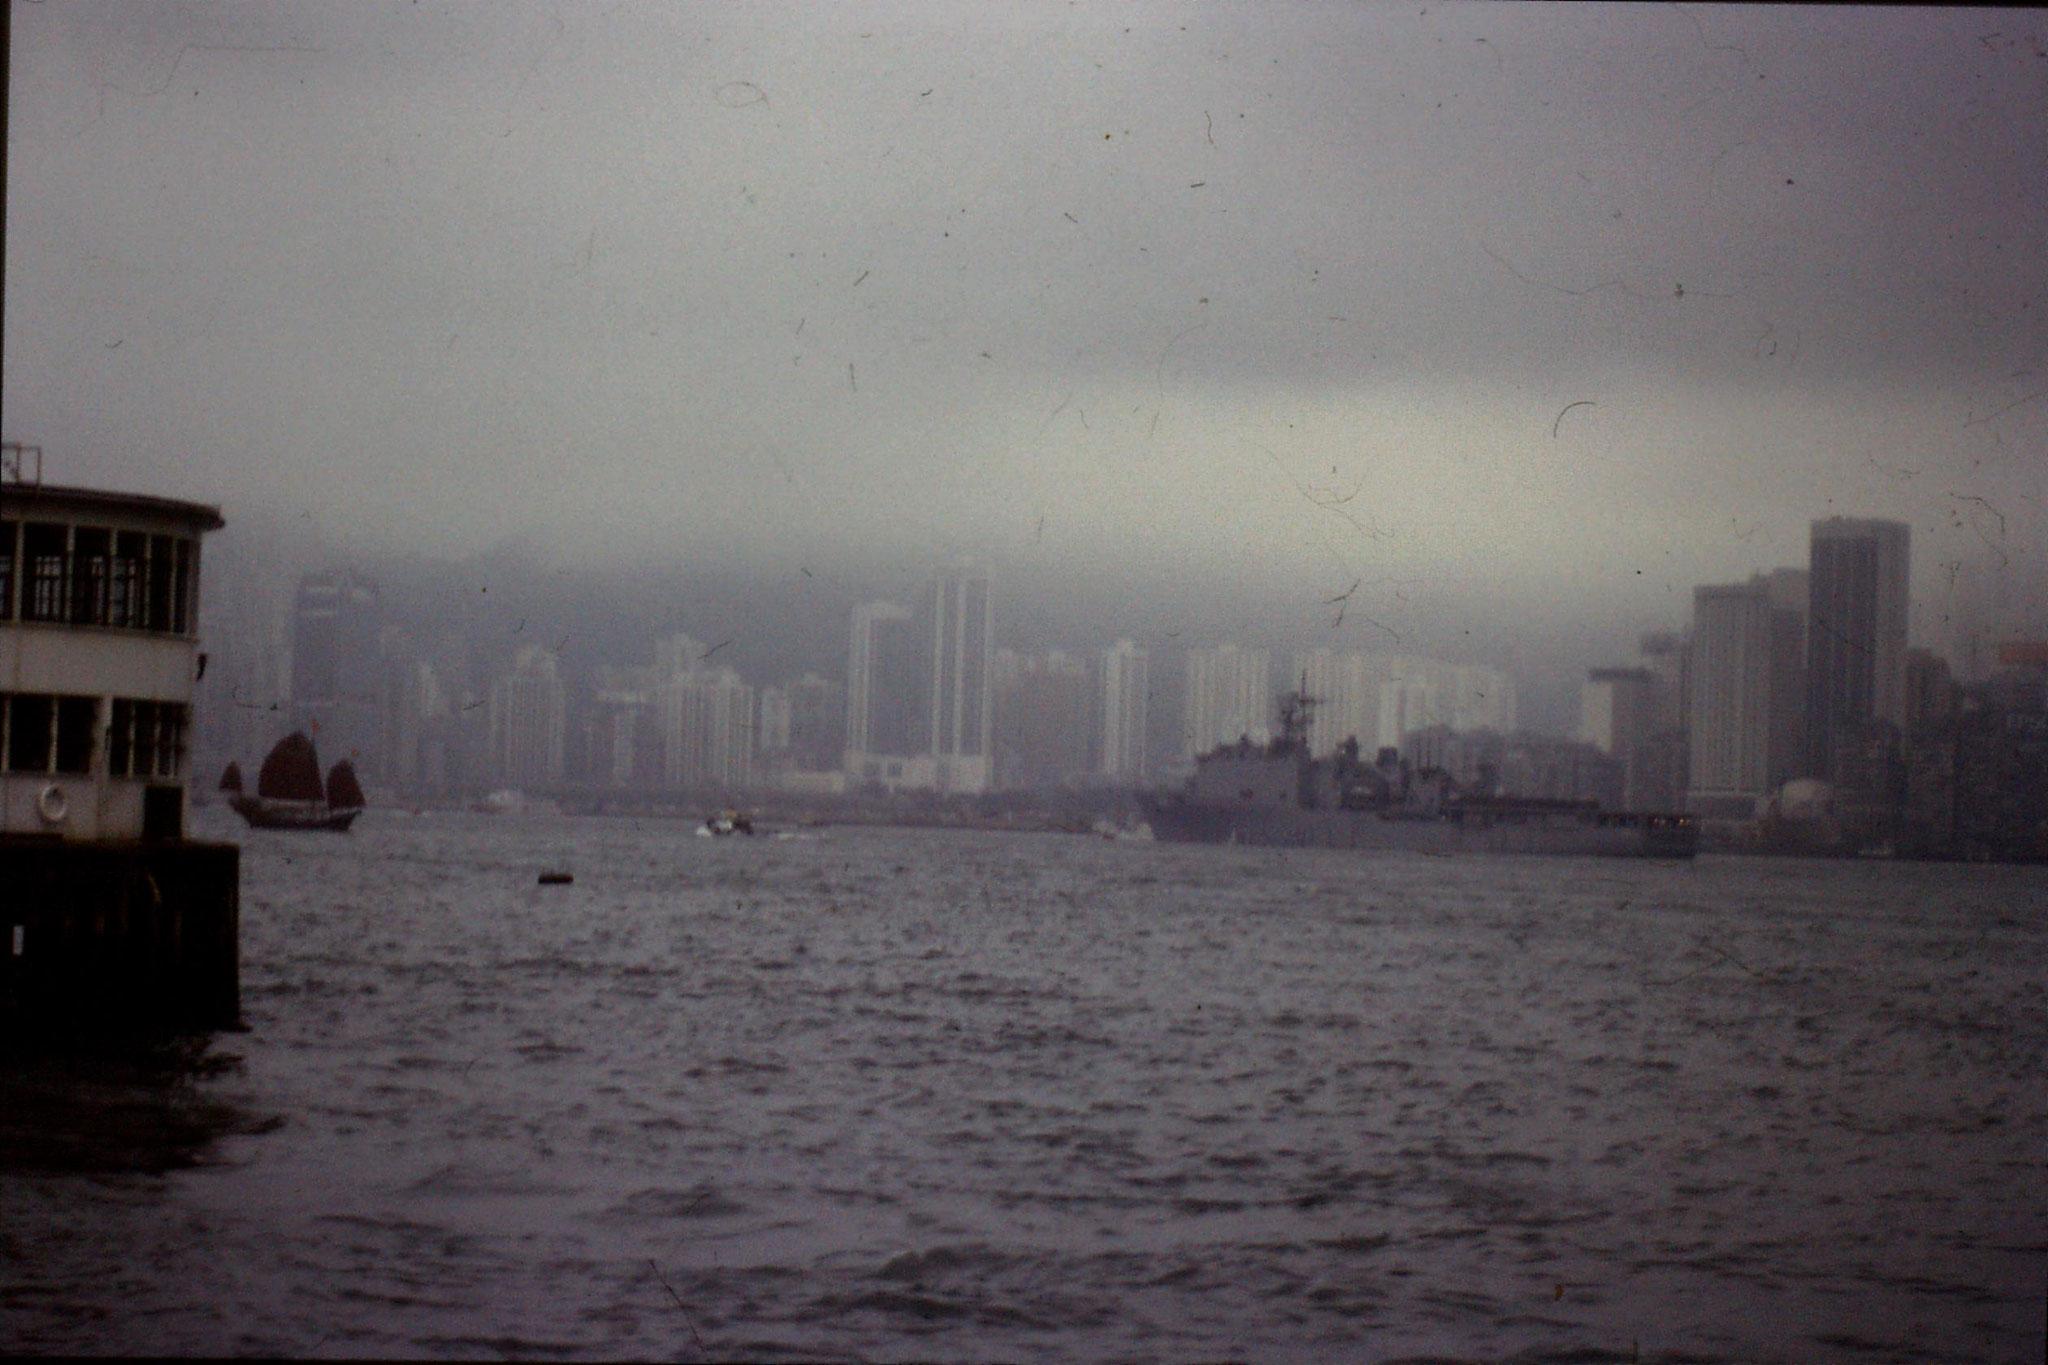 6/4/1989: 21: harbour